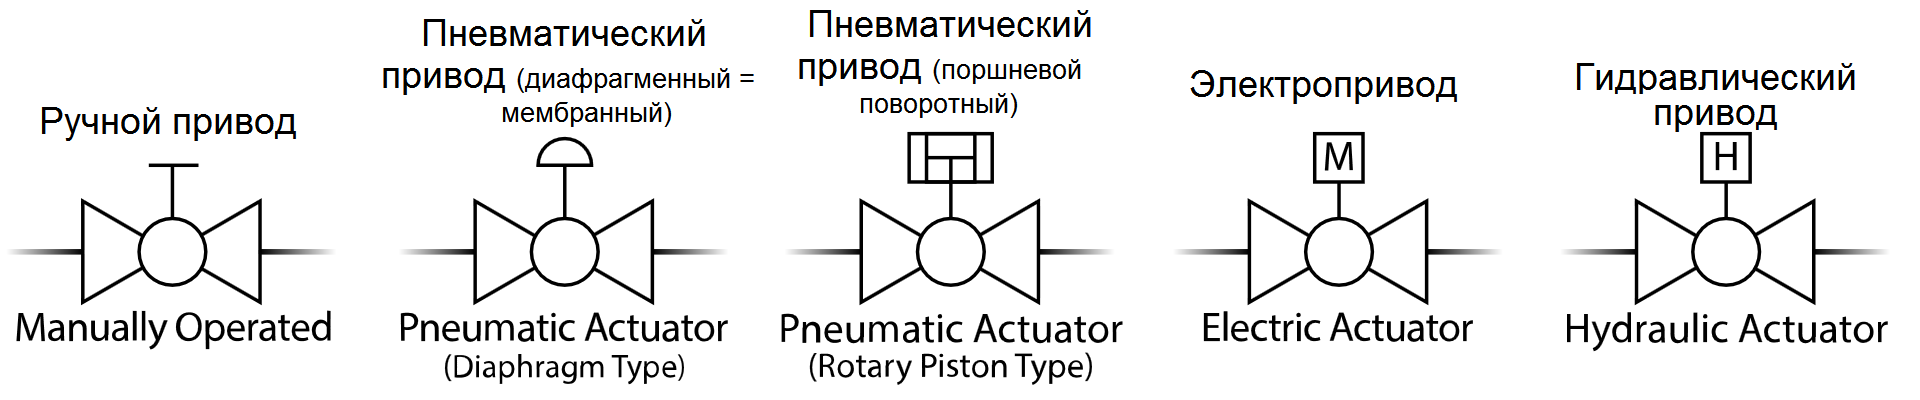 Тип привода трубопроводной арматуры - символ для P&ID